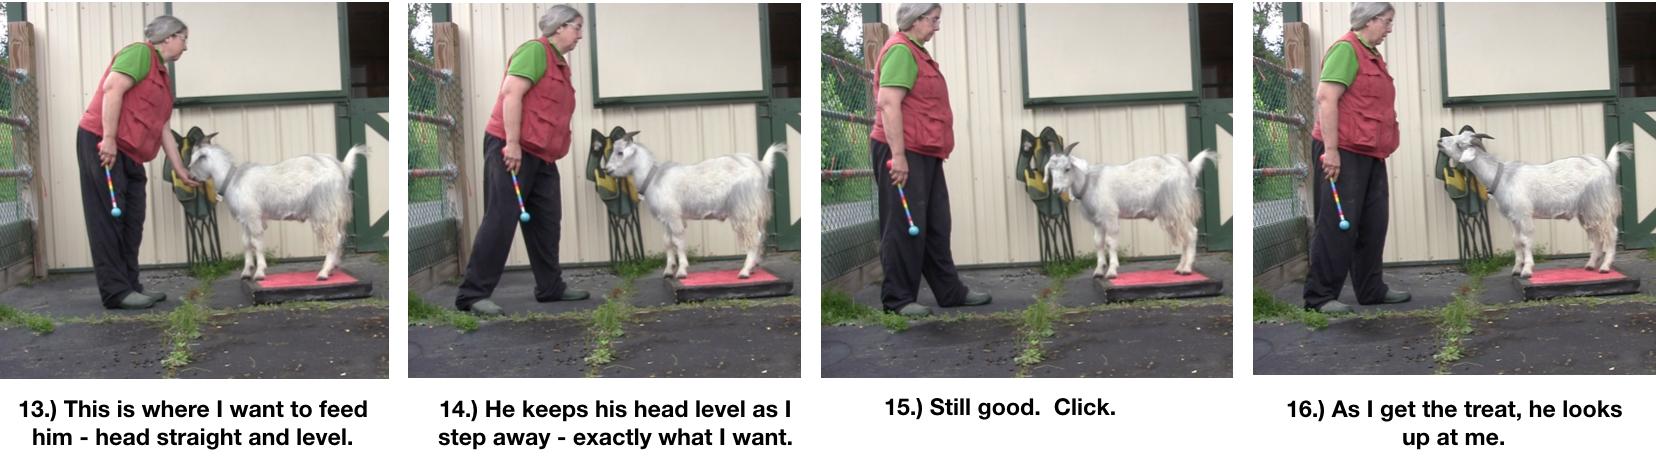 Goat Diaries Day 4 - P - Platforms Pt 1 - ppanels 13-16.png